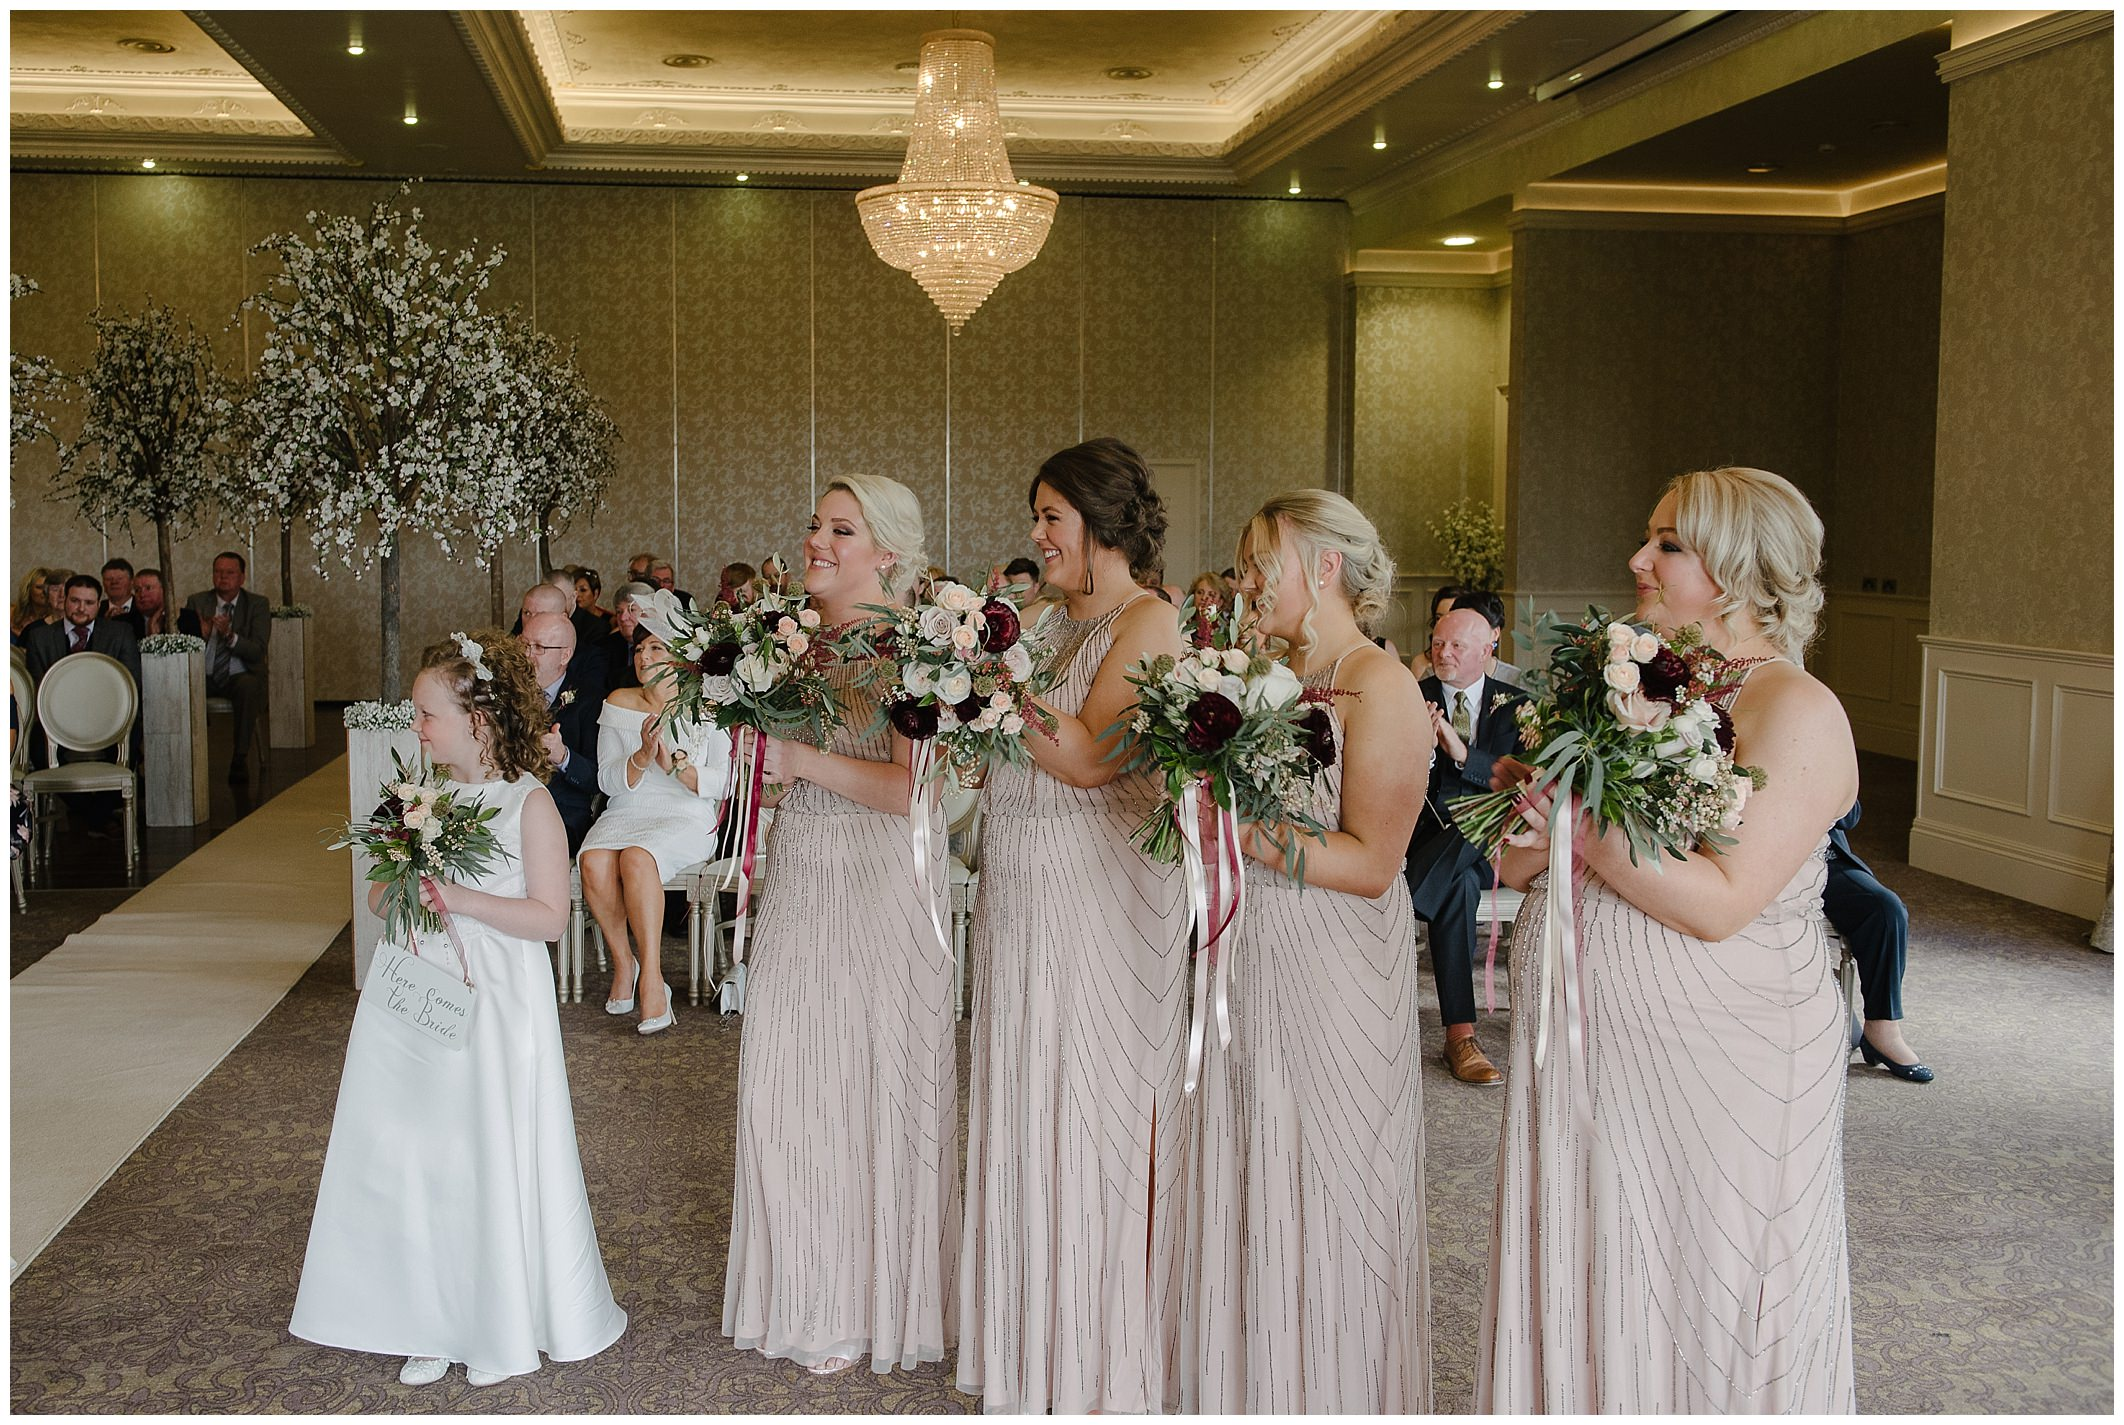 corick-house-wedding-hannah-gary-jude-browne-photography_0040.jpg